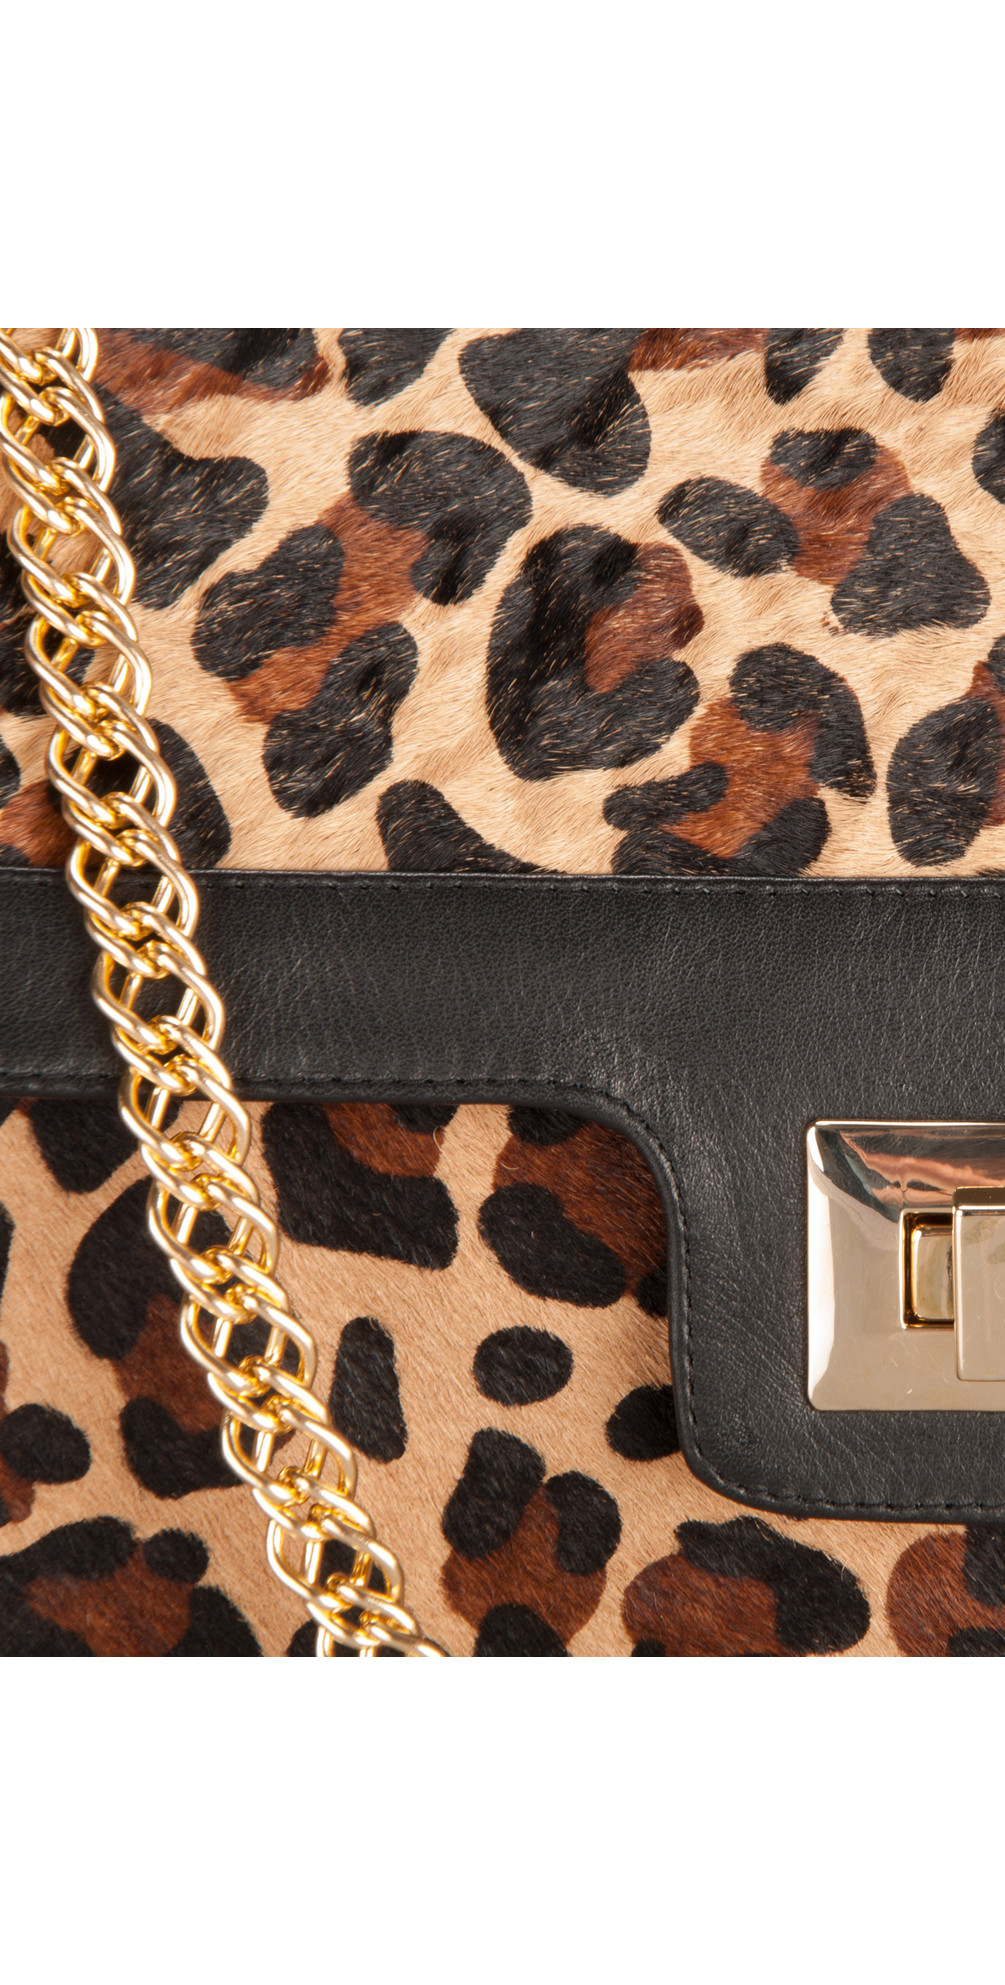 Leopard Print Leather Bag main image